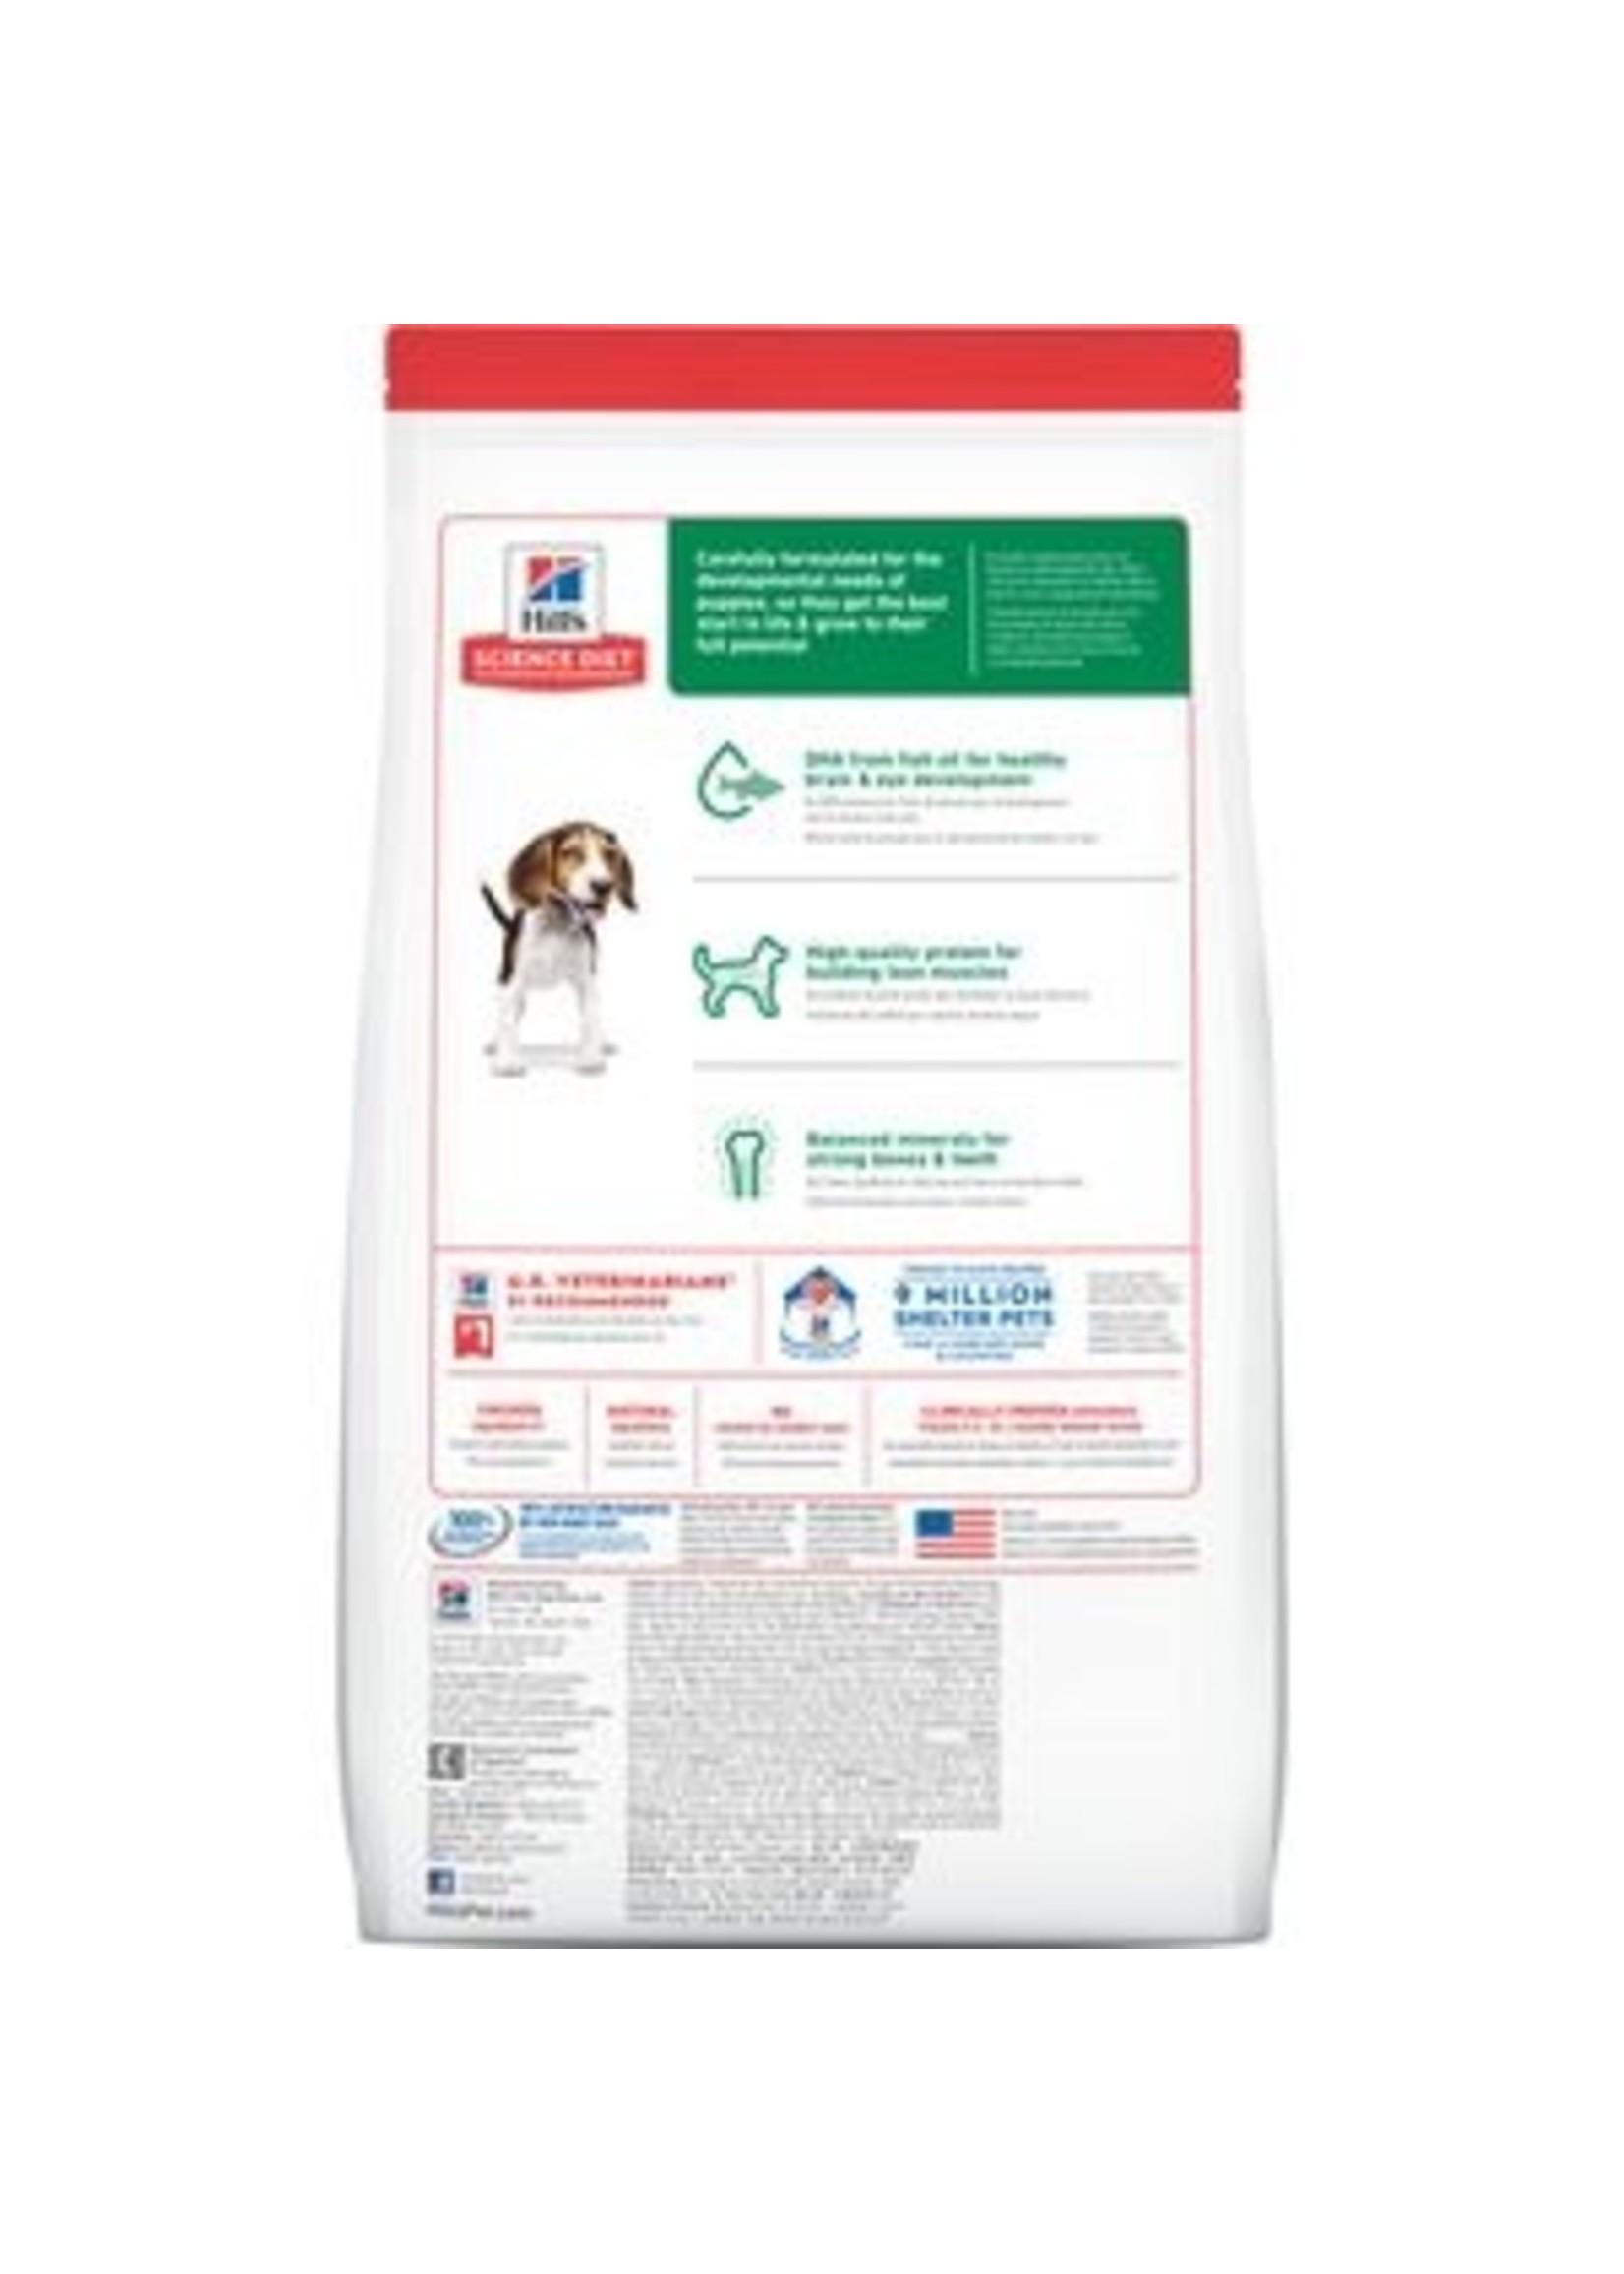 Hill's Science Diet Hill's Science Diet Puppy Chicken Meal & Barley